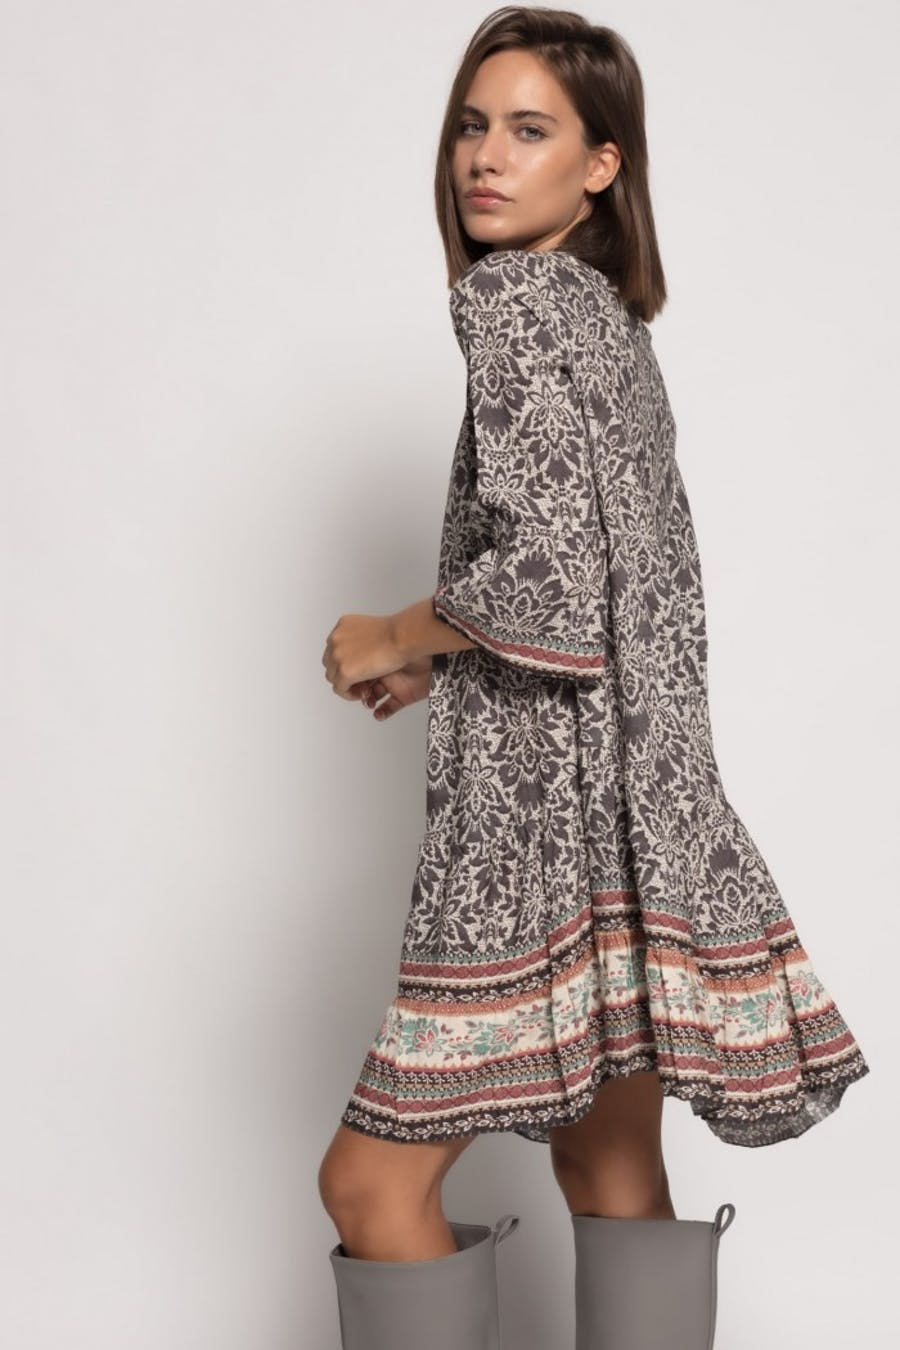 Vestido Cassual estampado